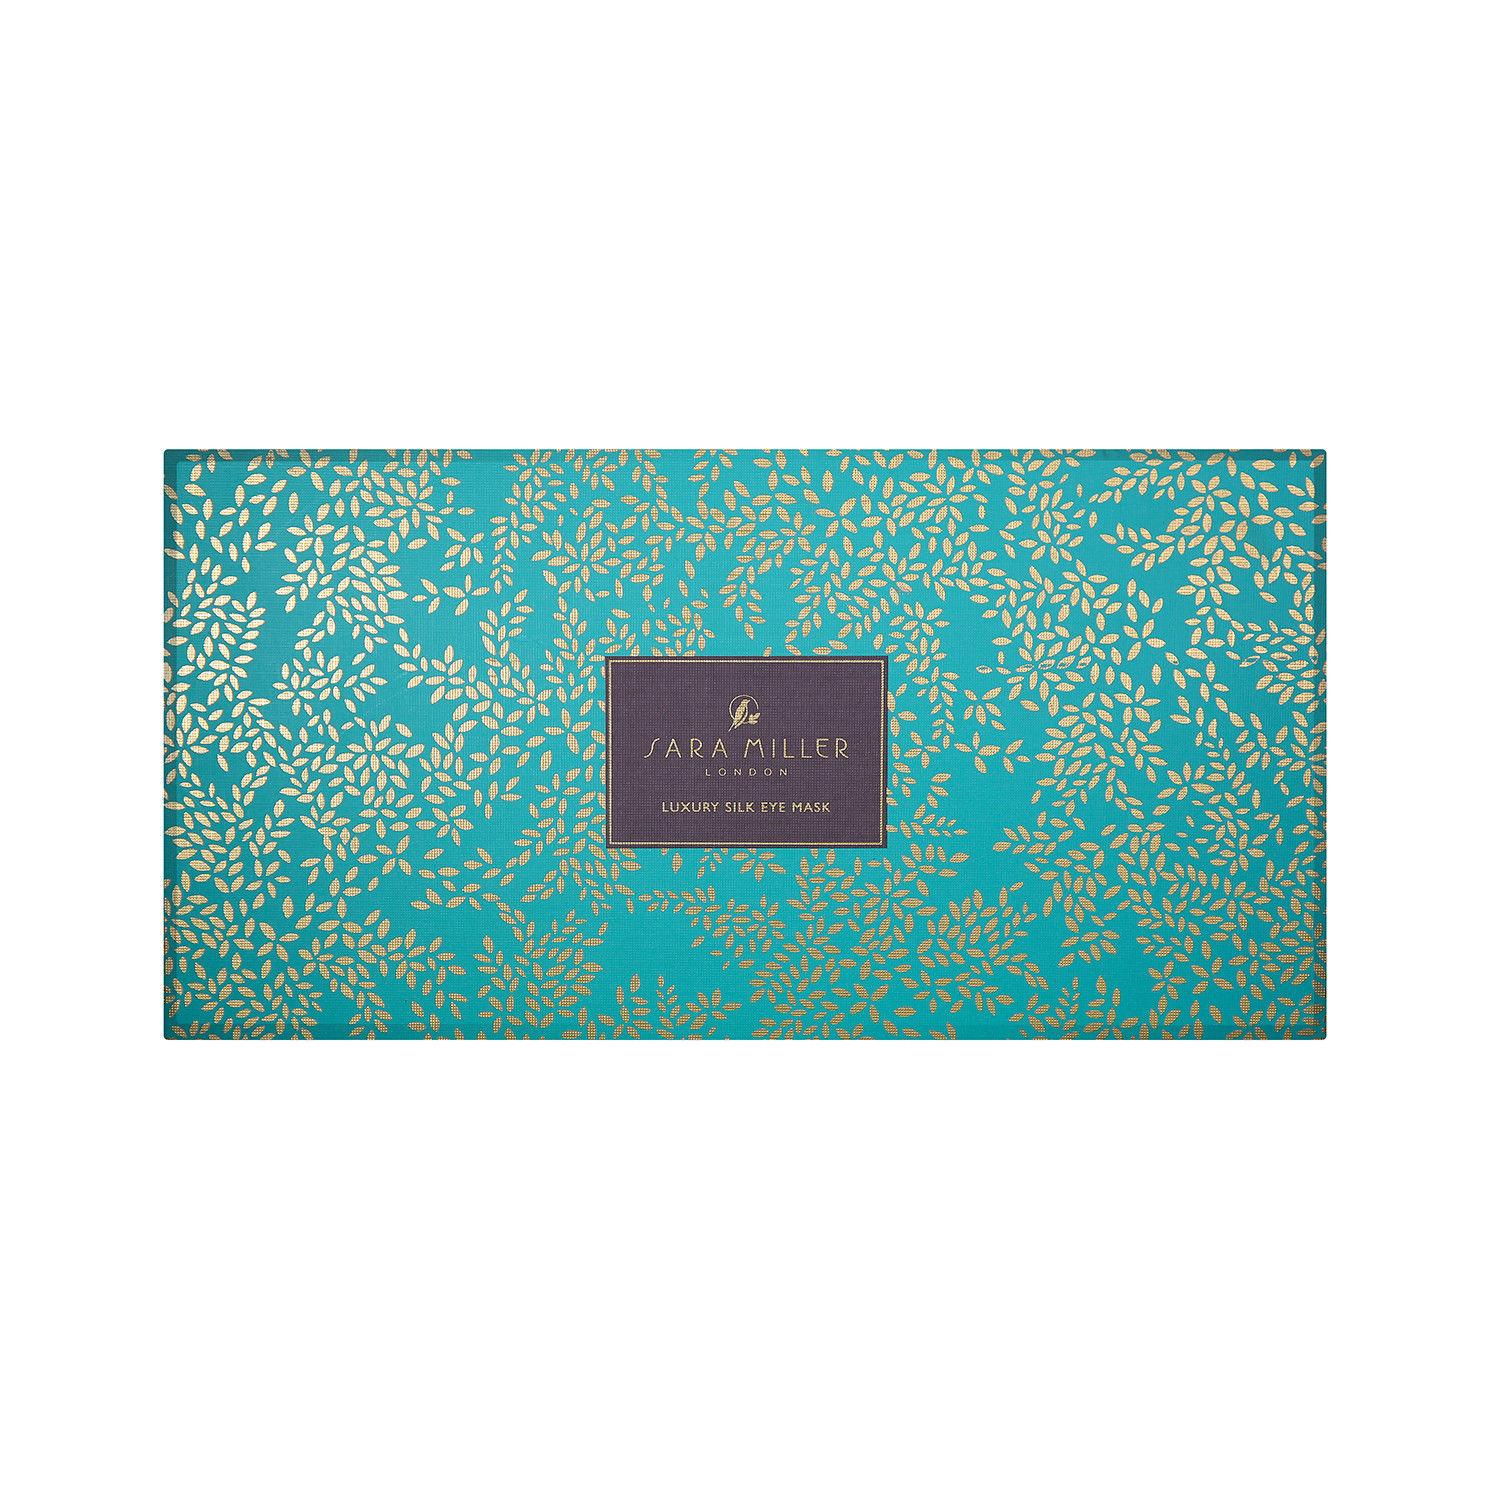 Sara Miller – Green Toucan Silk Eye Mask in Presentation Gift Box